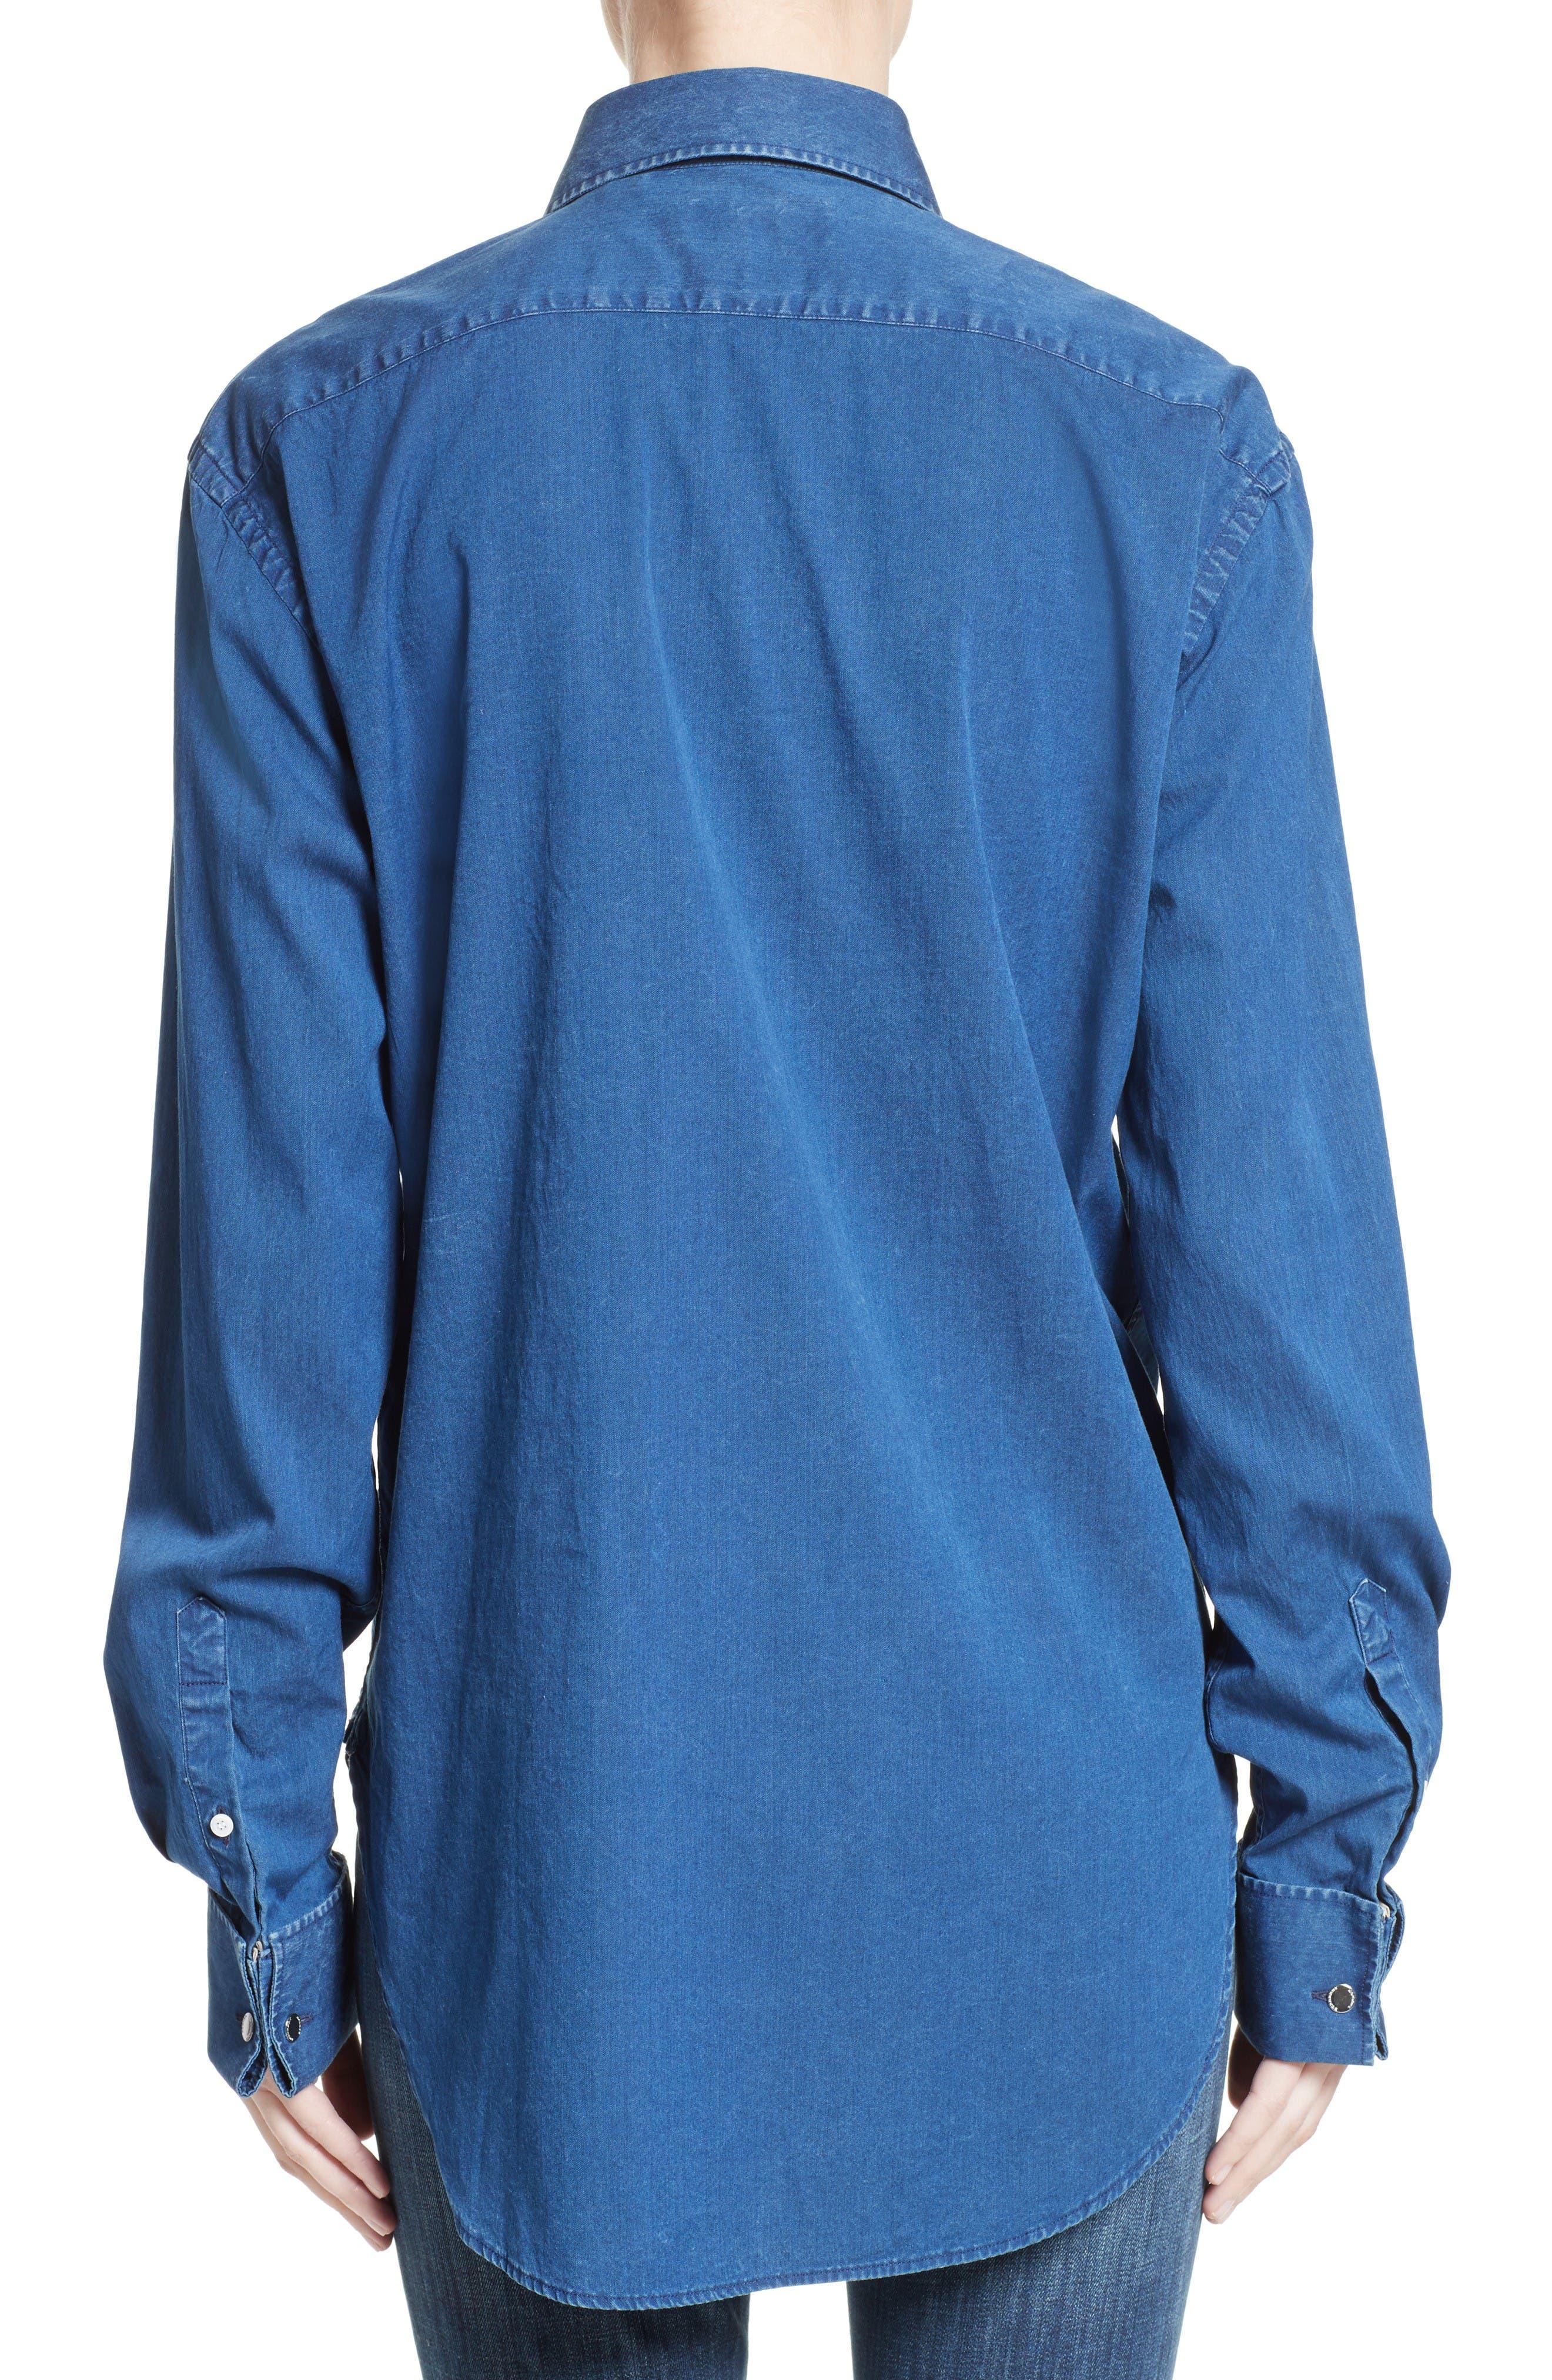 Alternate Image 2  - Burberry Jaden Pintuck Denim Shirt